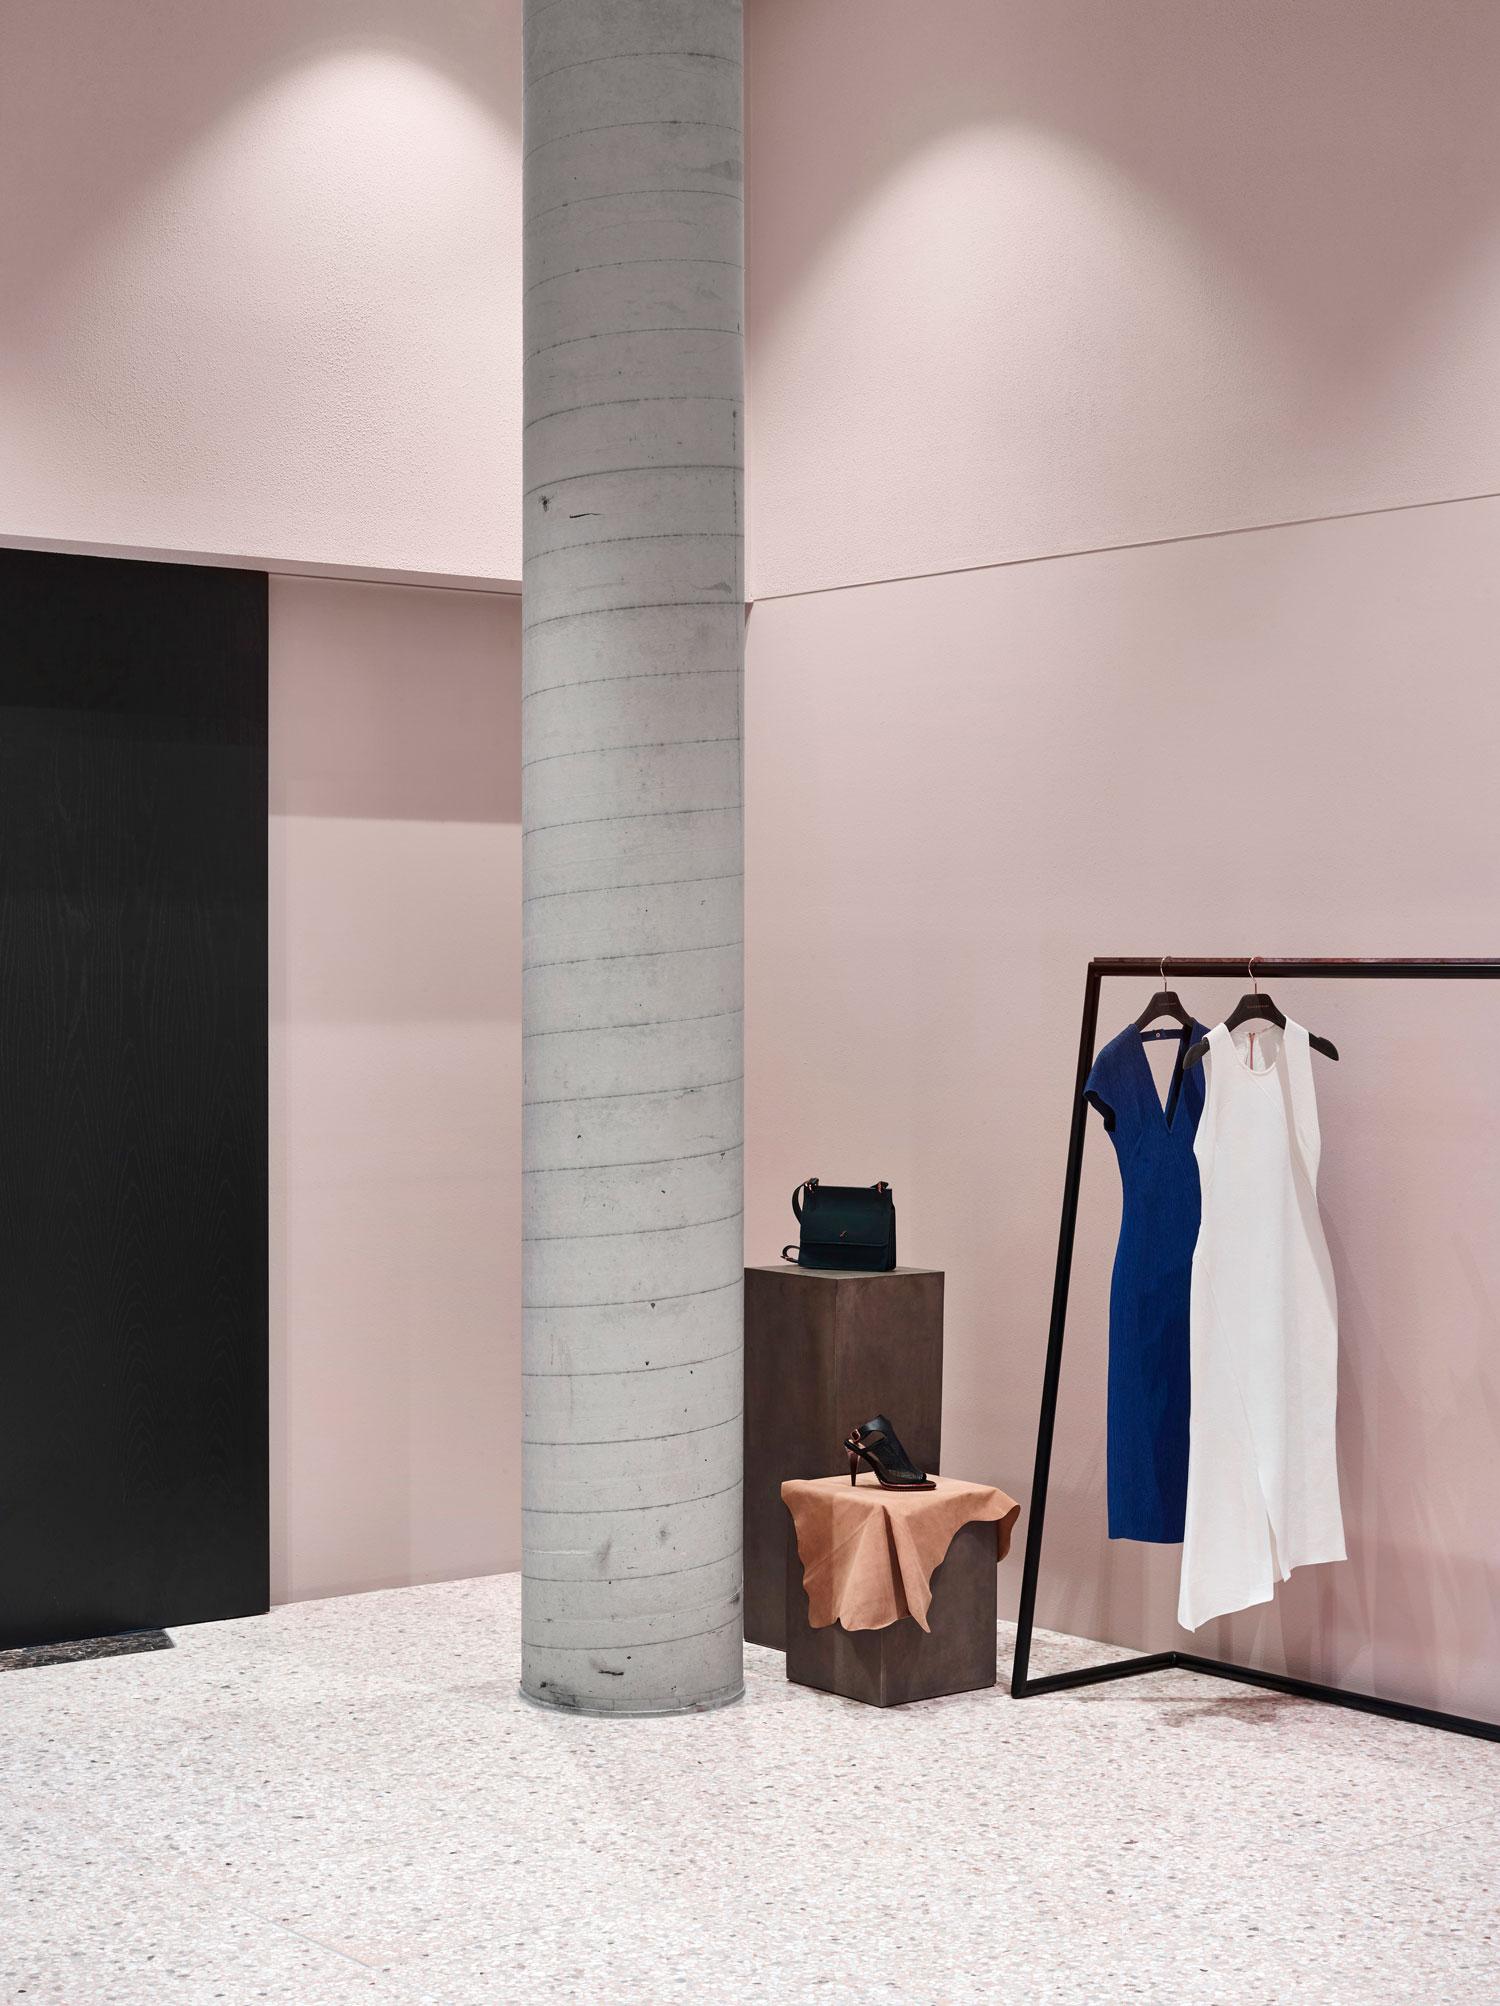 Flack Studios New Retail Concept for Ginger  Smart